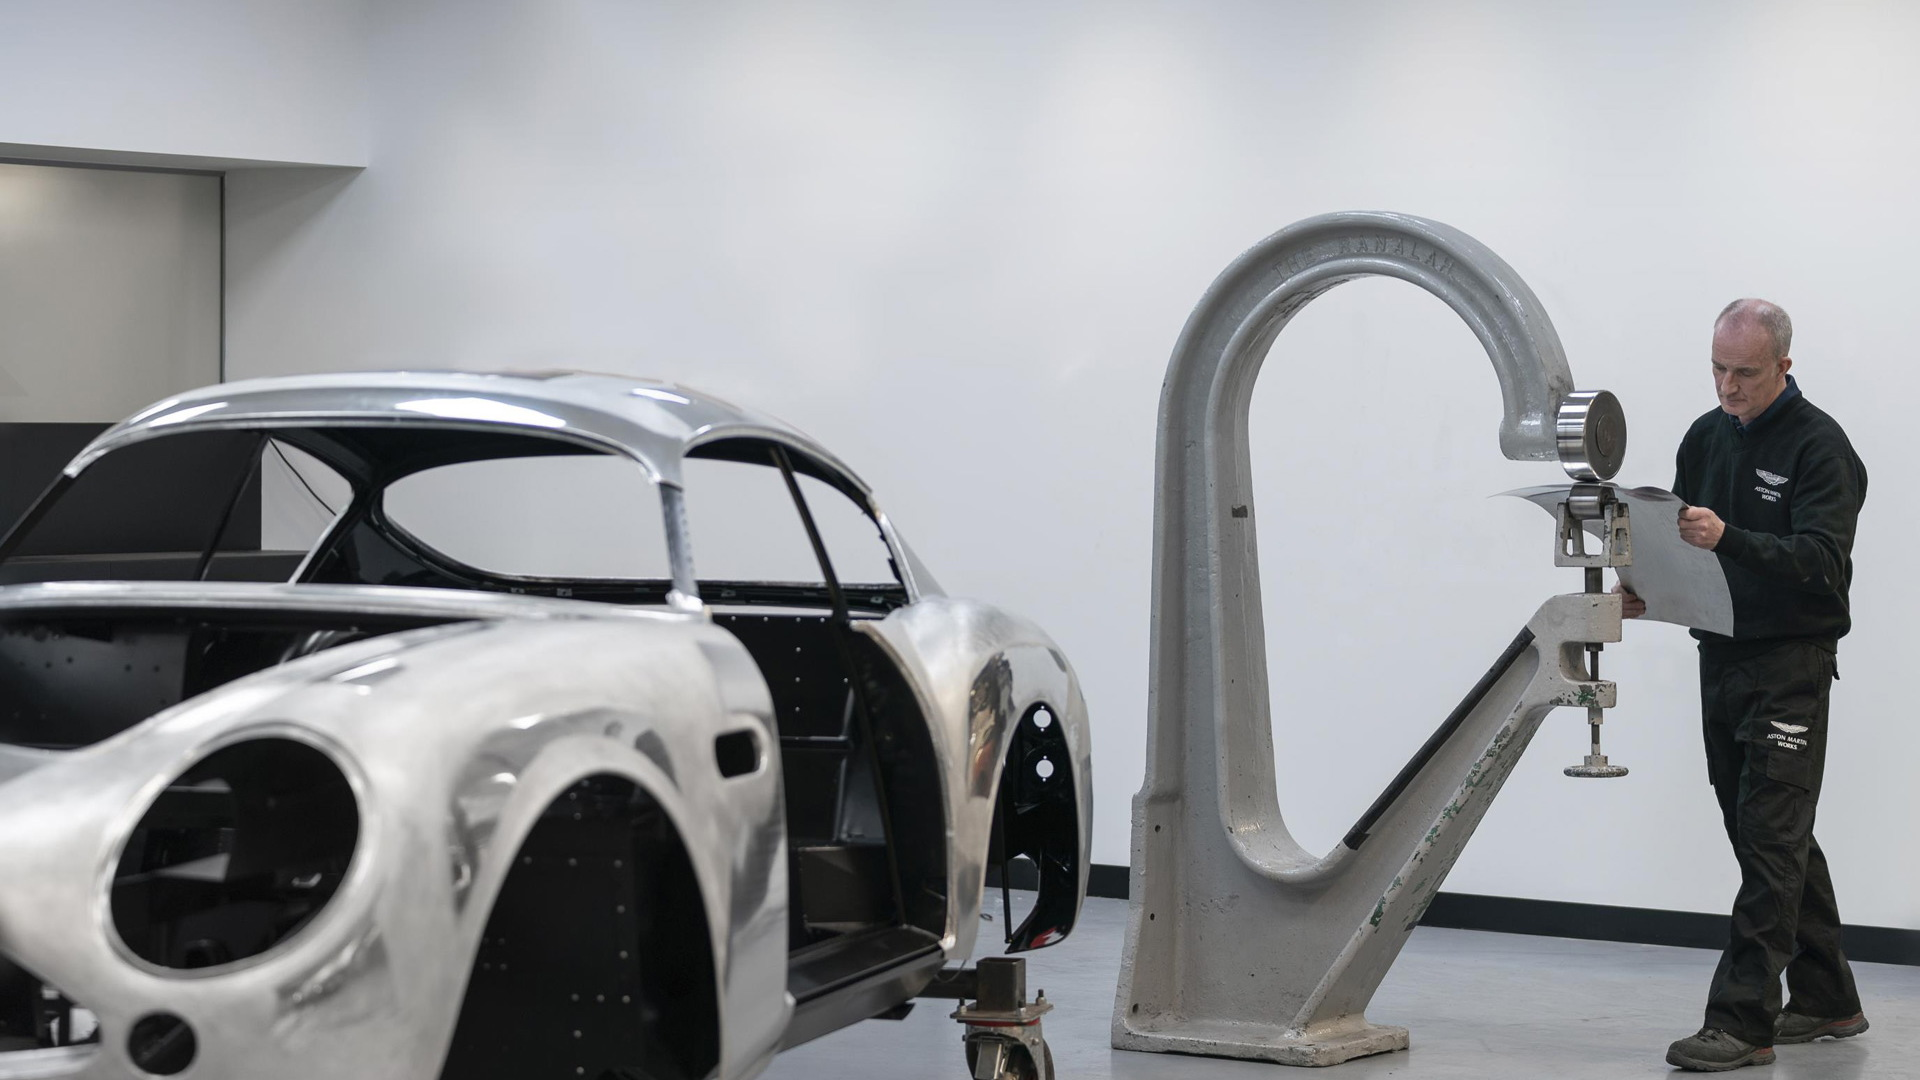 Production of bodies for Aston Martin DB4 GT Zagato continuation models - April 2019